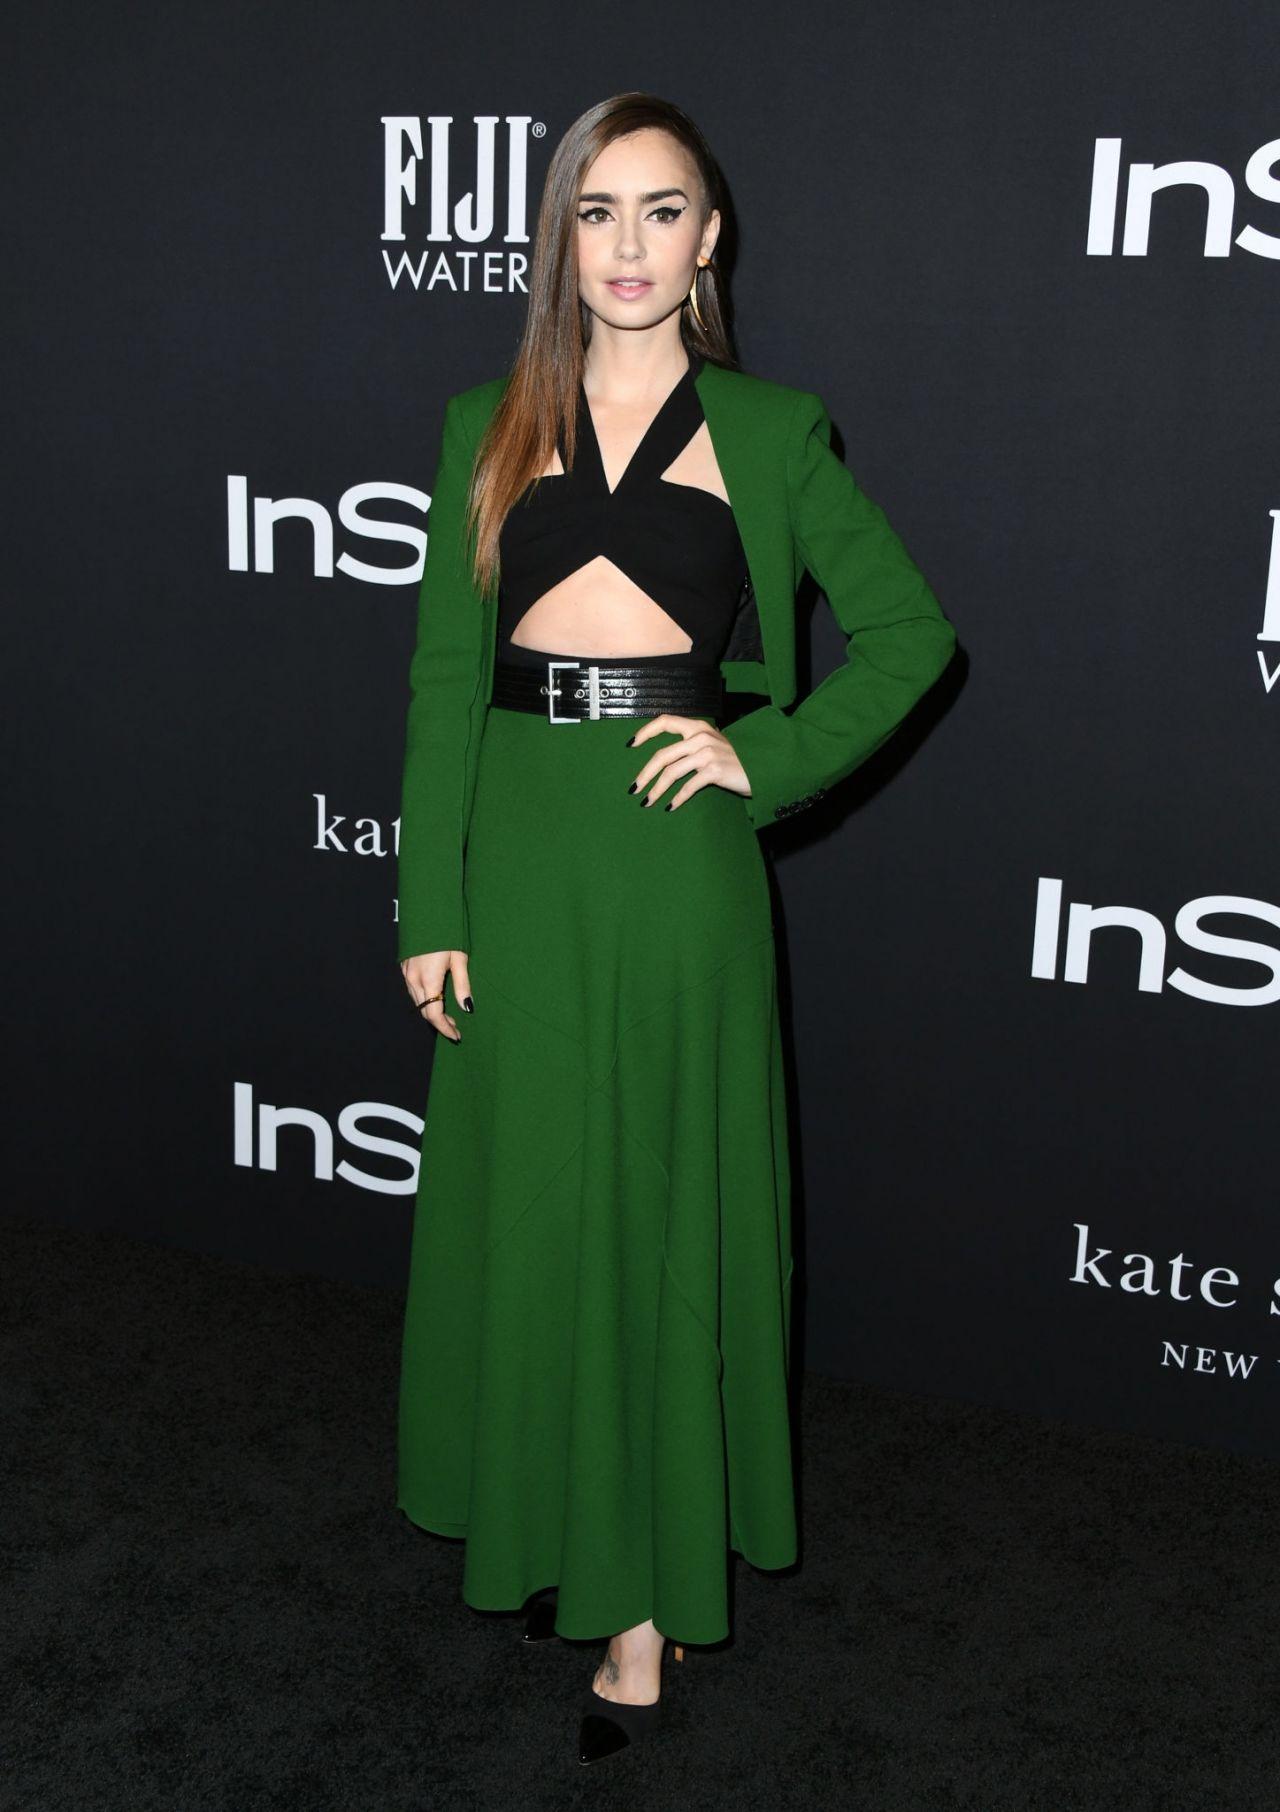 https://celebmafia.com/wp-content/uploads/2018/10/lily-collins-2018-instyle-awards-8.jpg